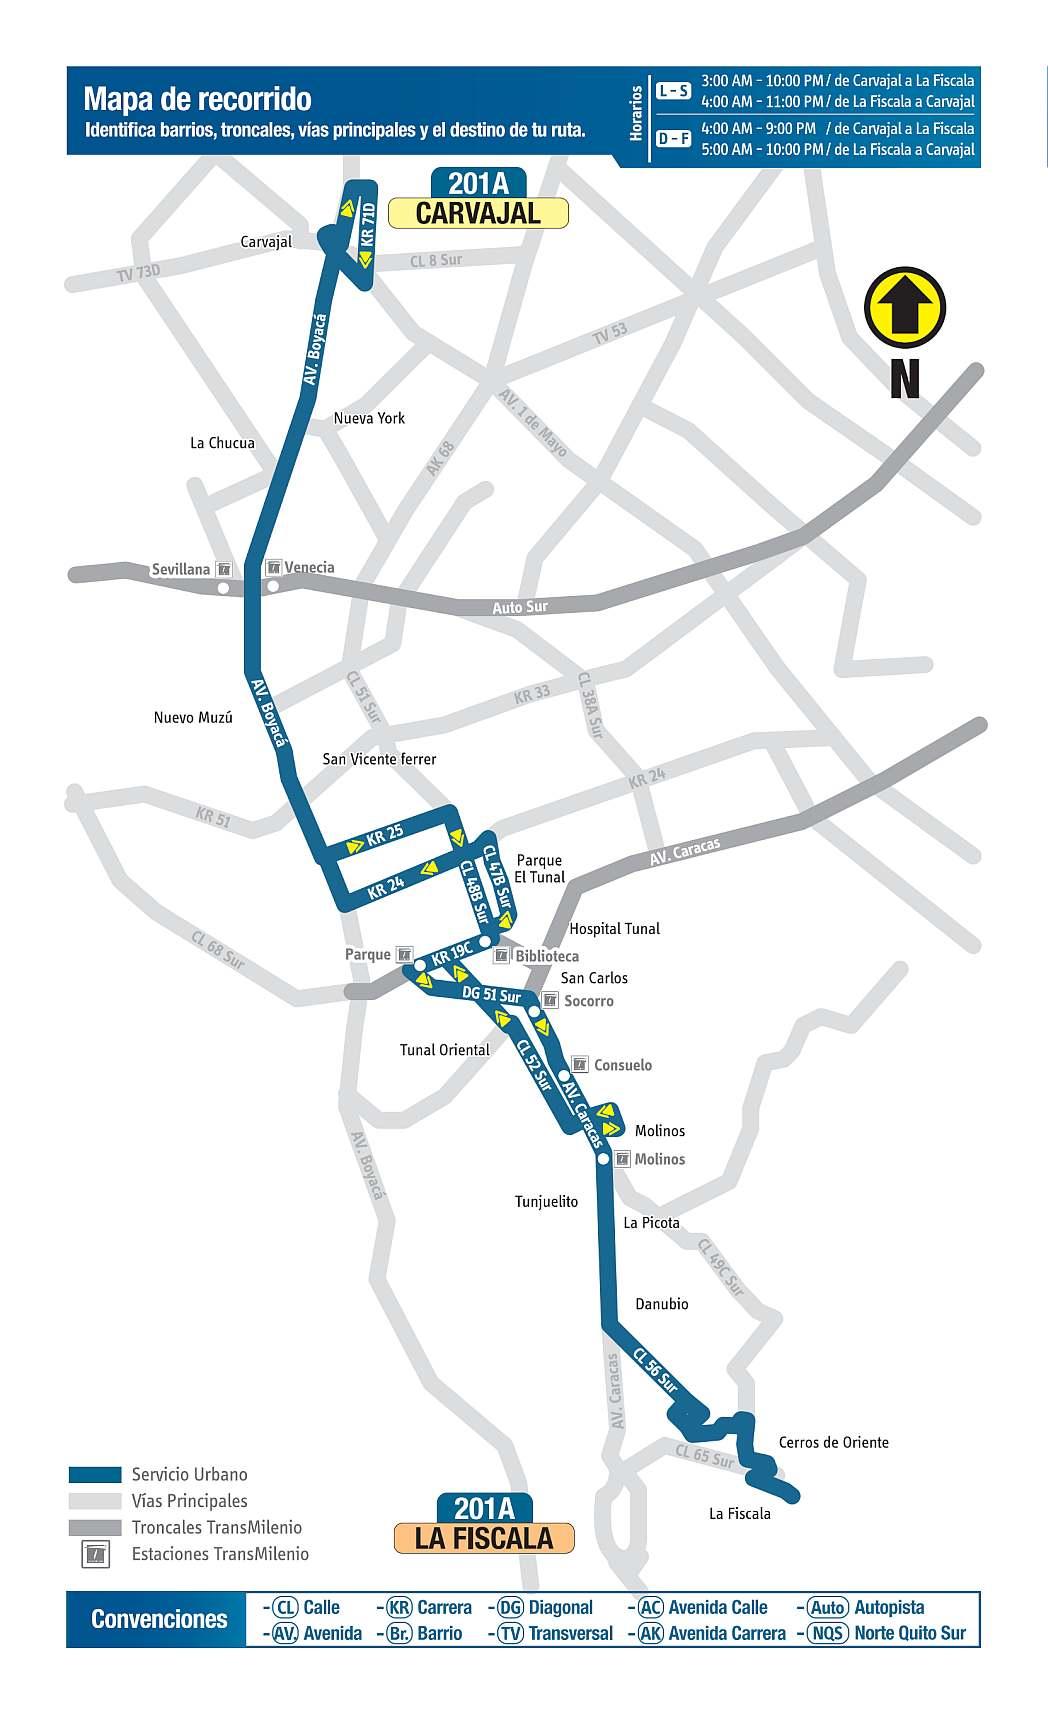 201A Carvajal - La Fiscala, mapa bus urbano Bogotá